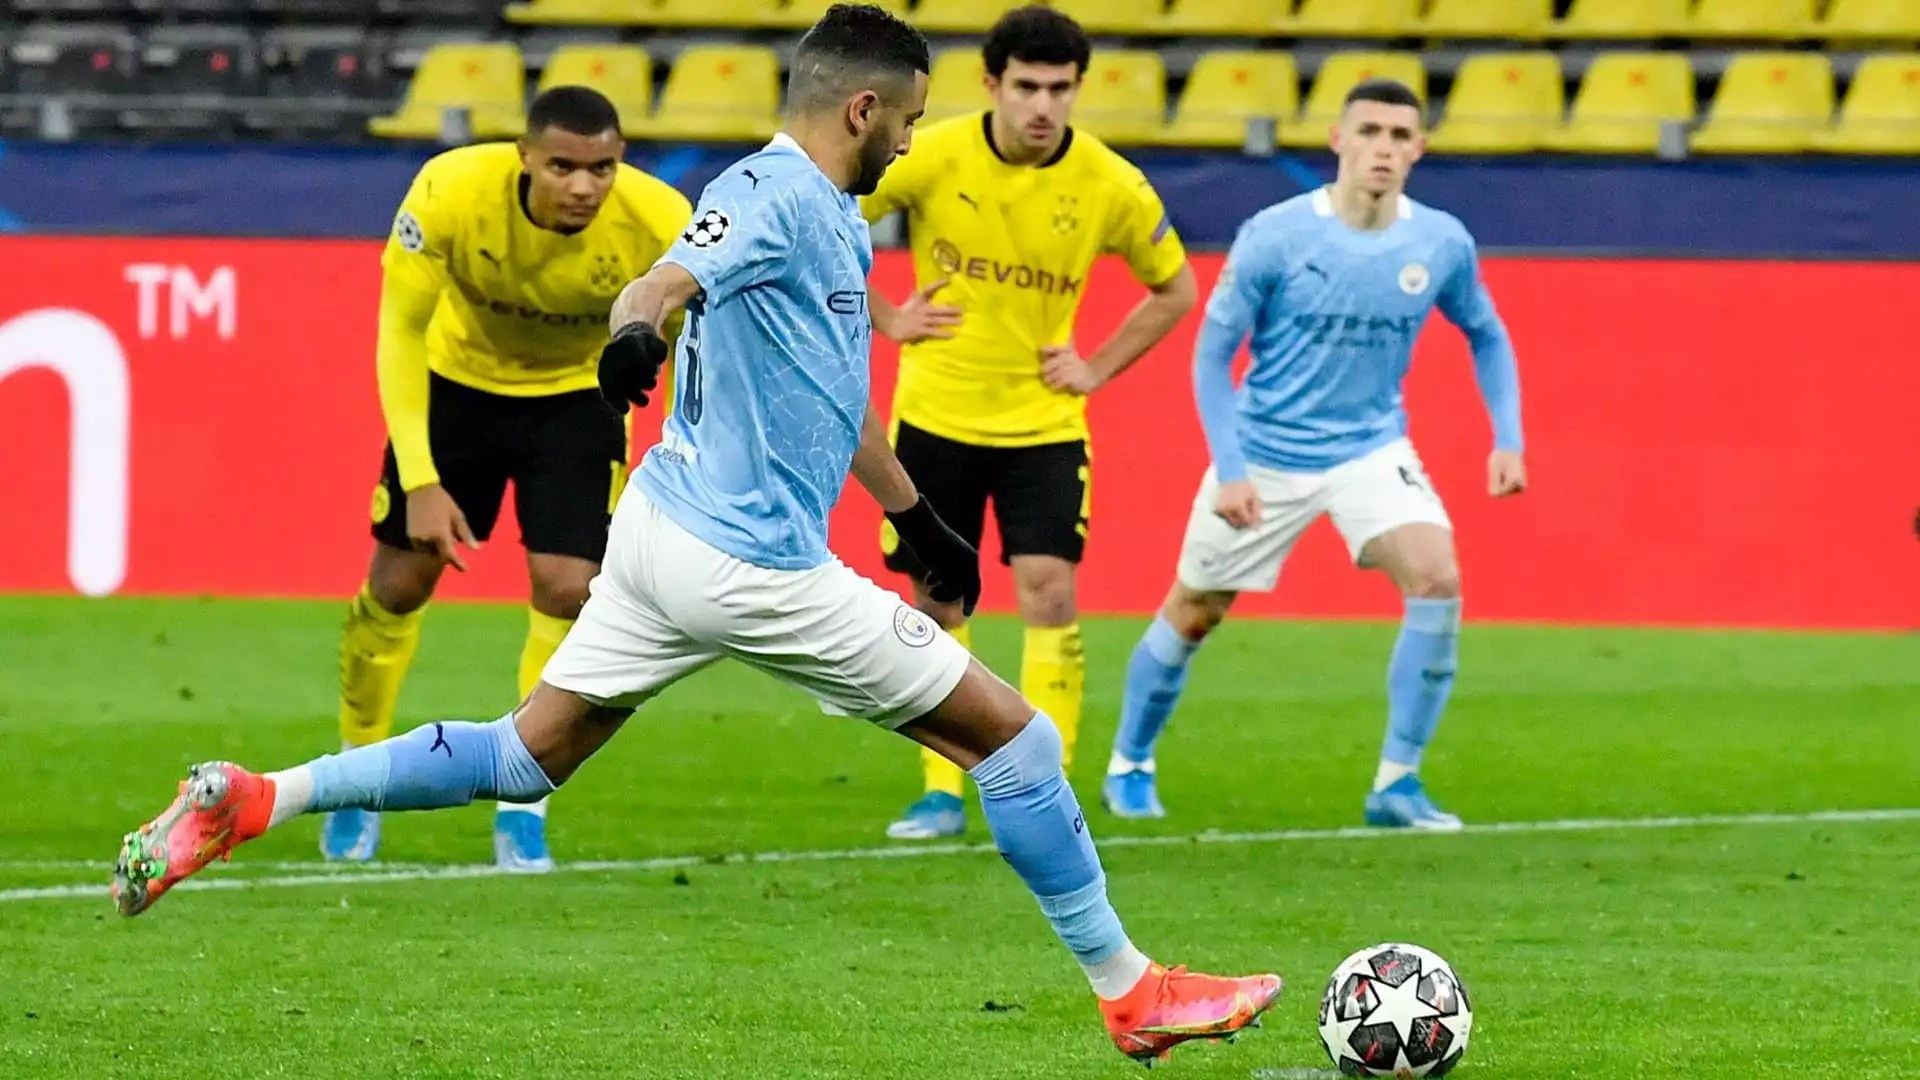 Ligue des champions : Riyad Mahrez propulse Manchester City (VIDEO)